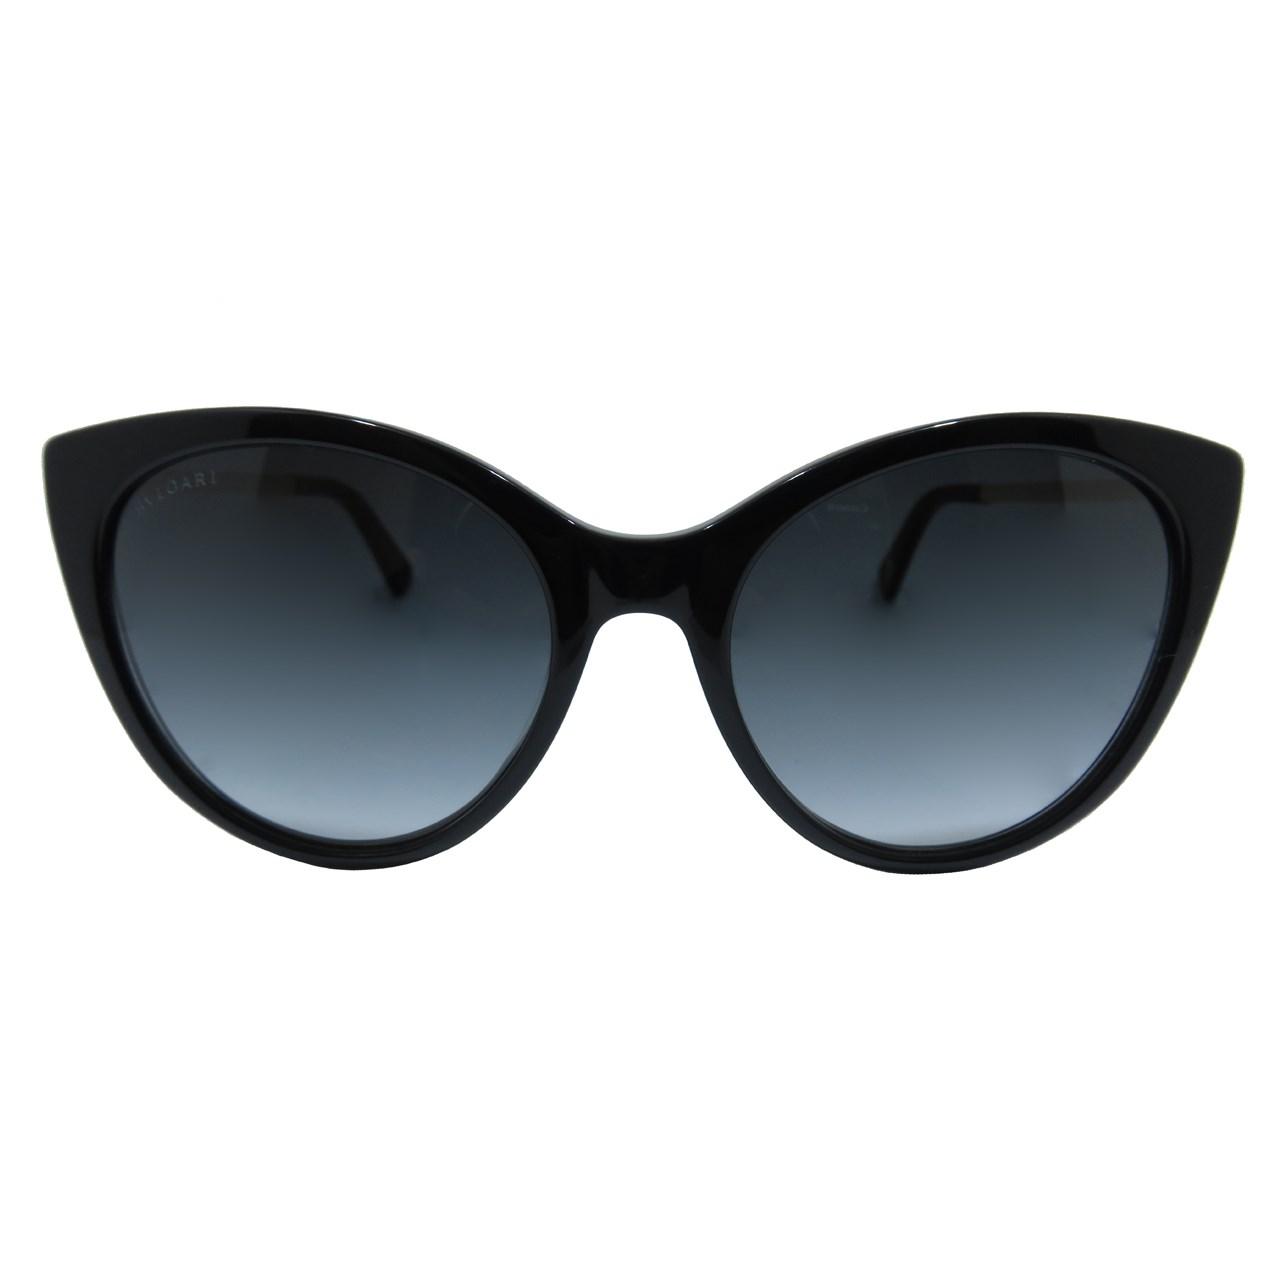 عینک آفتابی بولگاری مدل BV8195 501/8G 2N-Original 52